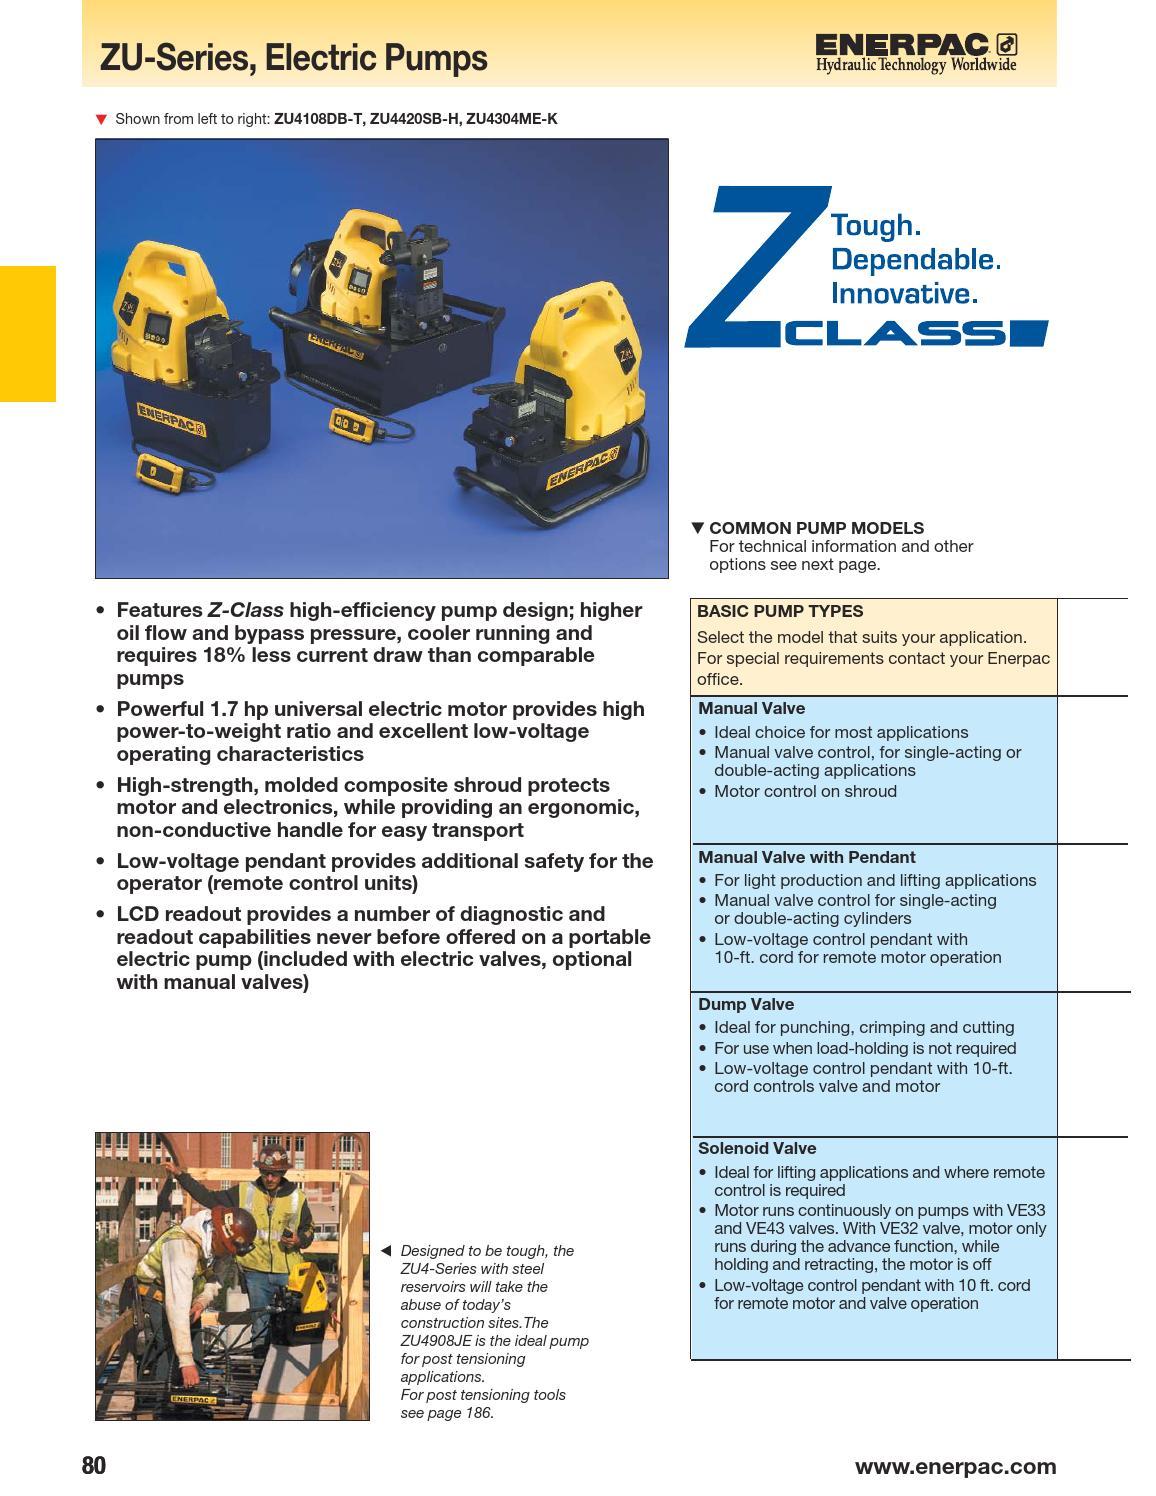 Enerpac zu series, electric pumps by jnarvaeze - issuu